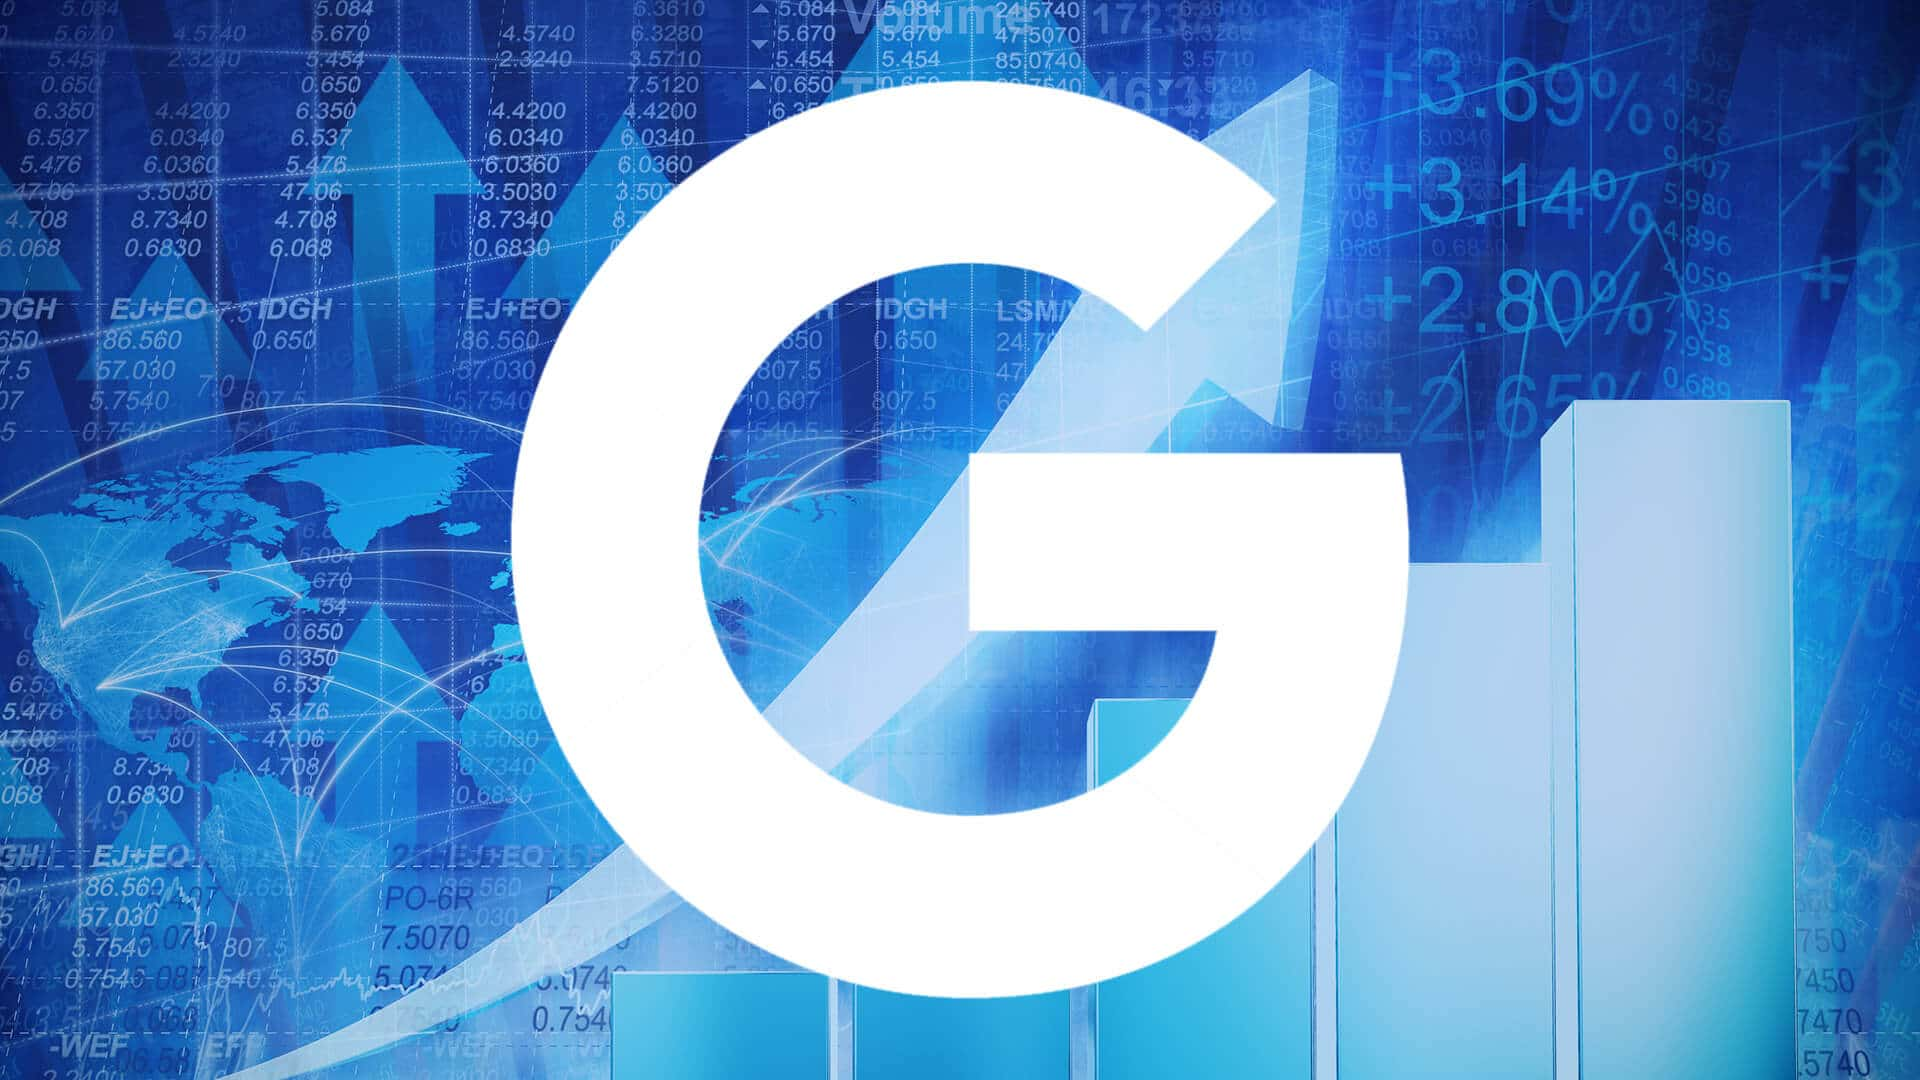 Filtrare i Dati su Google BigQuery, Google Cloud Platform GCP - e-Service